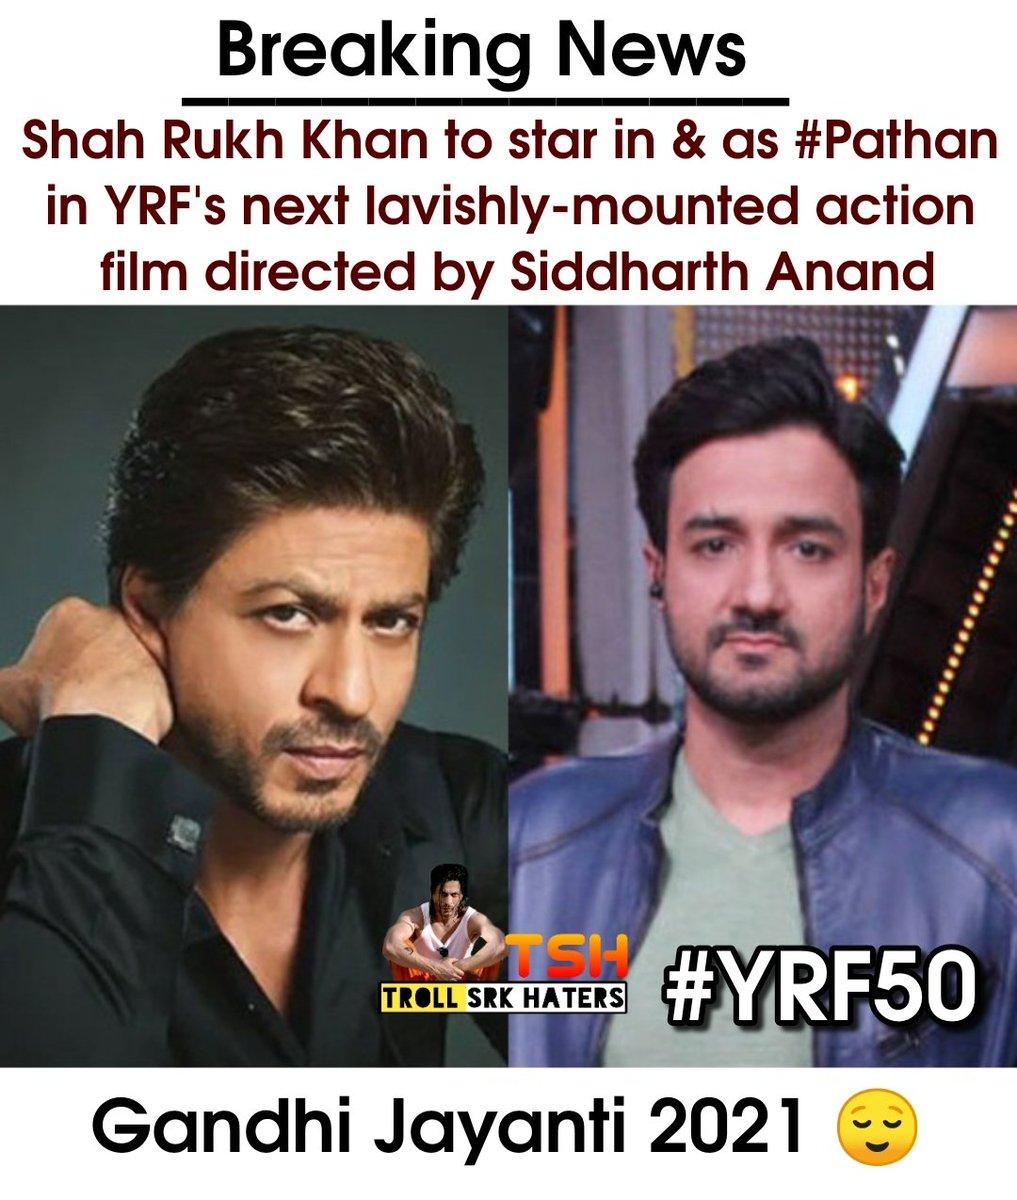 Breaking news ❤️ #SRK #SiddharthAnand #YRF50